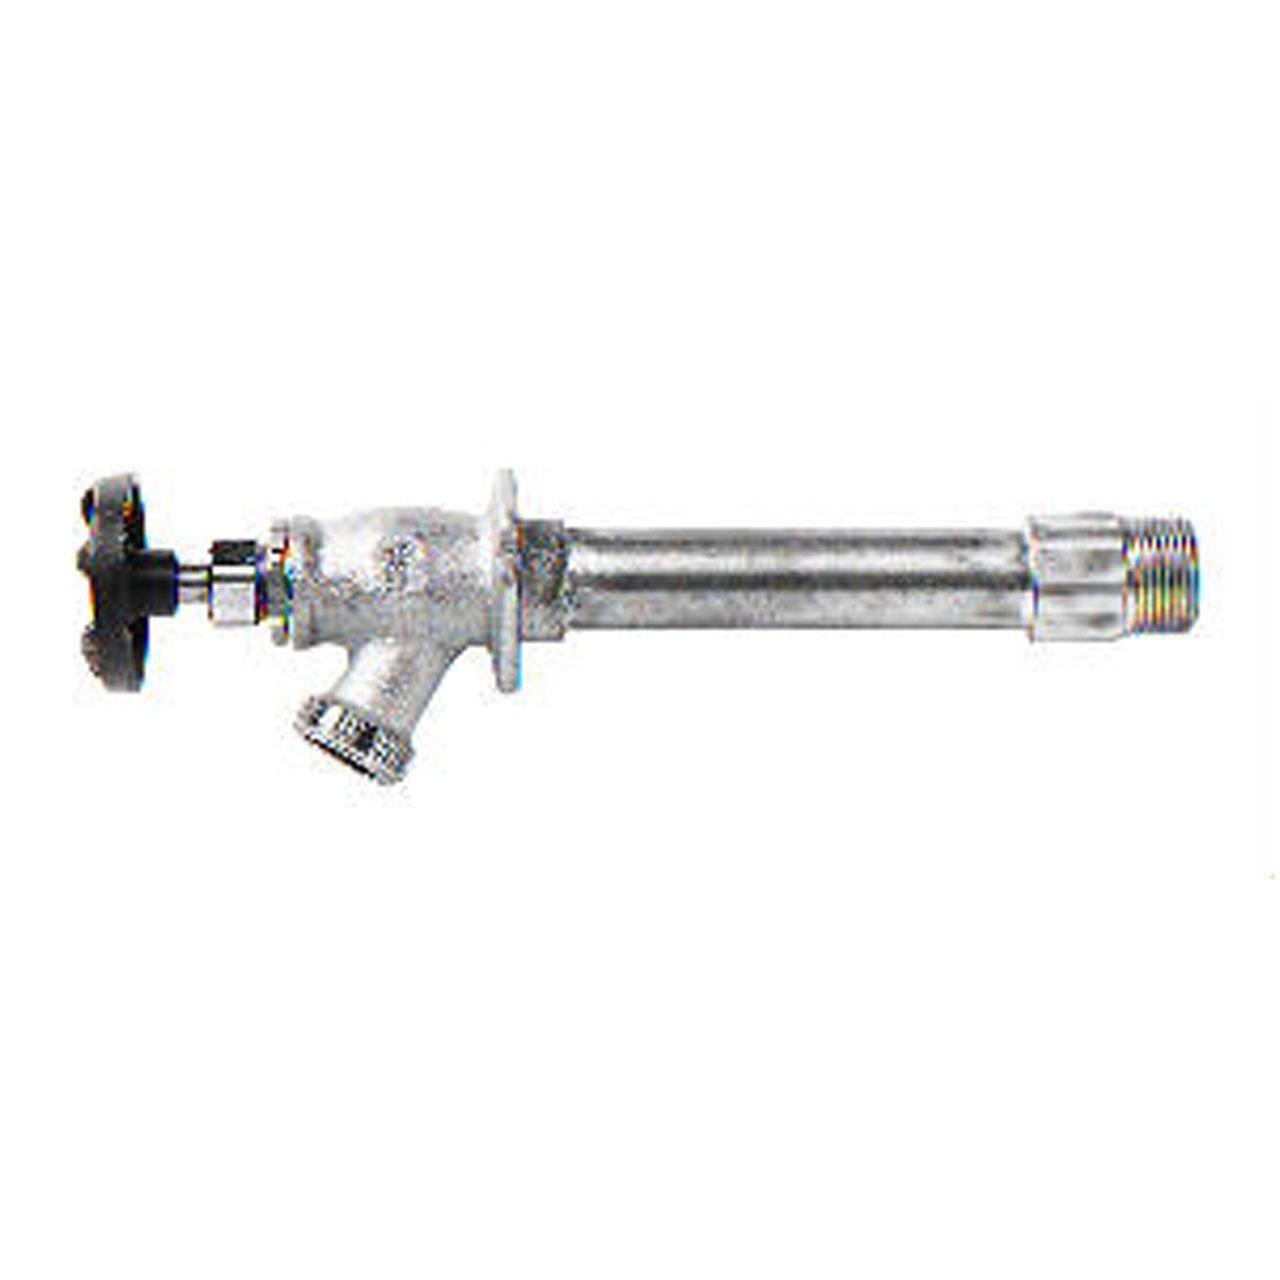 Amazon.com : Arrowhead 455-08 8-Inch Standard Frost-Free Hydrant ...